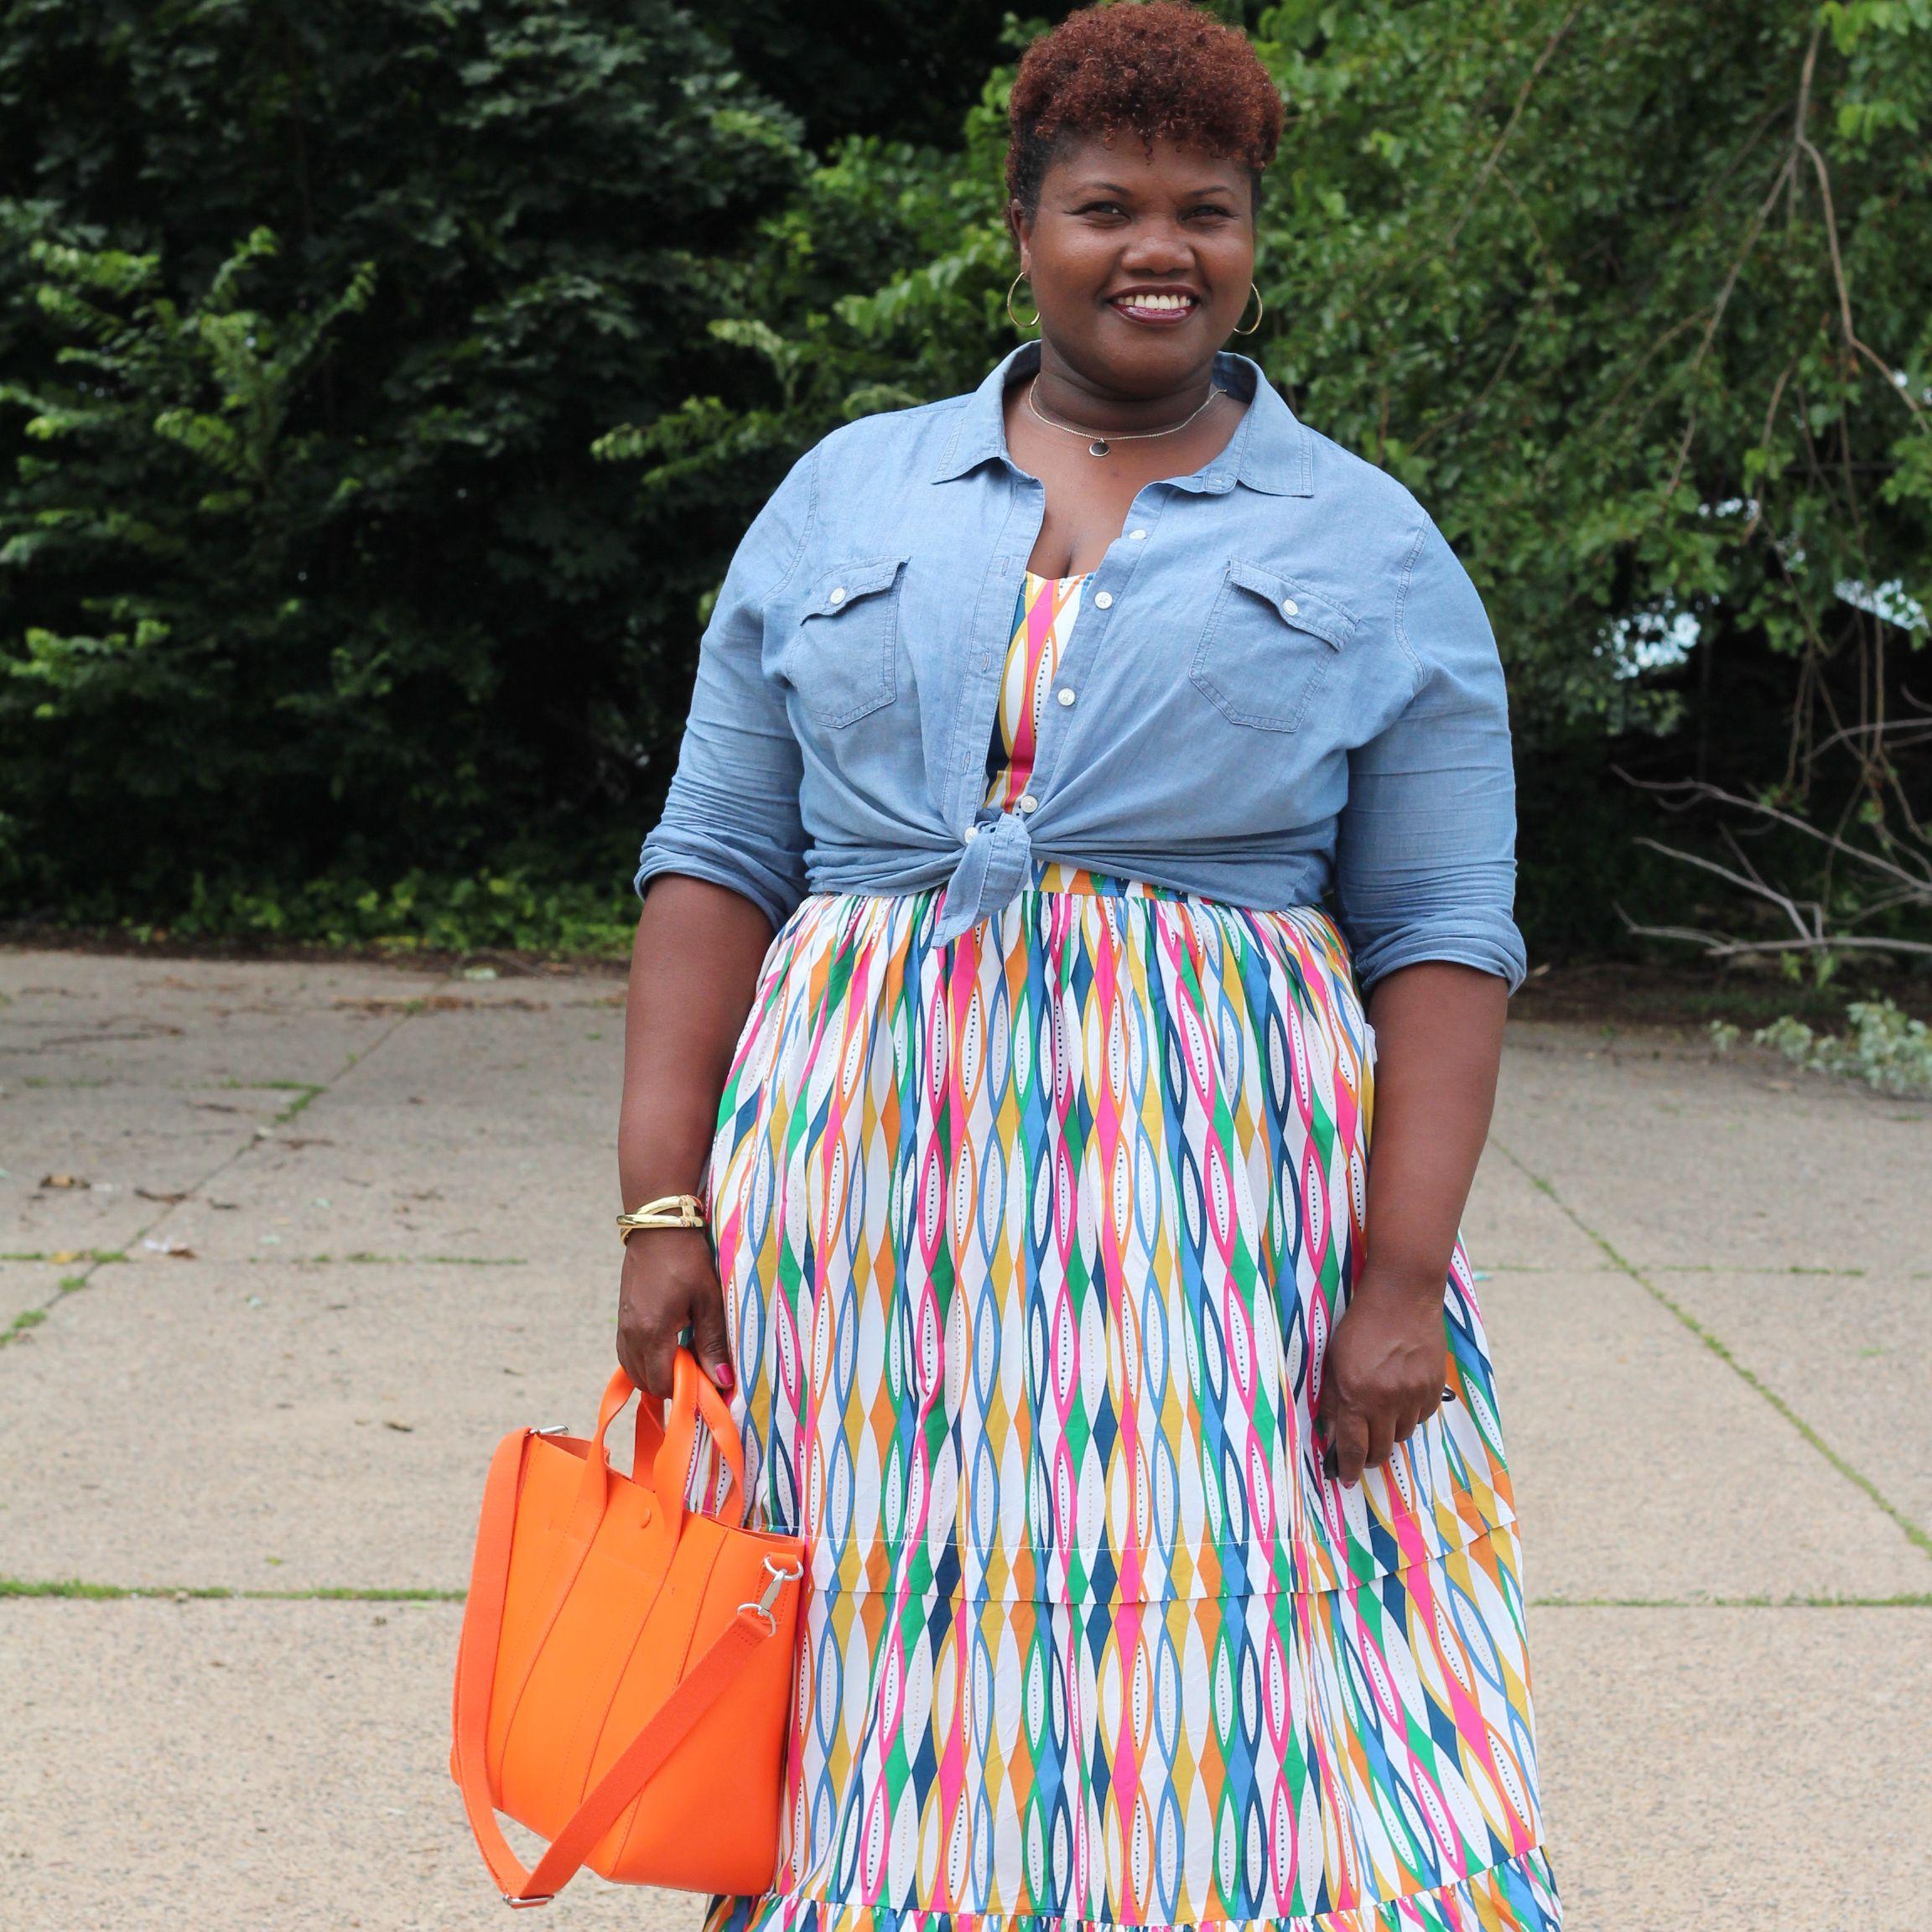 Woman in denim shirt and sundress